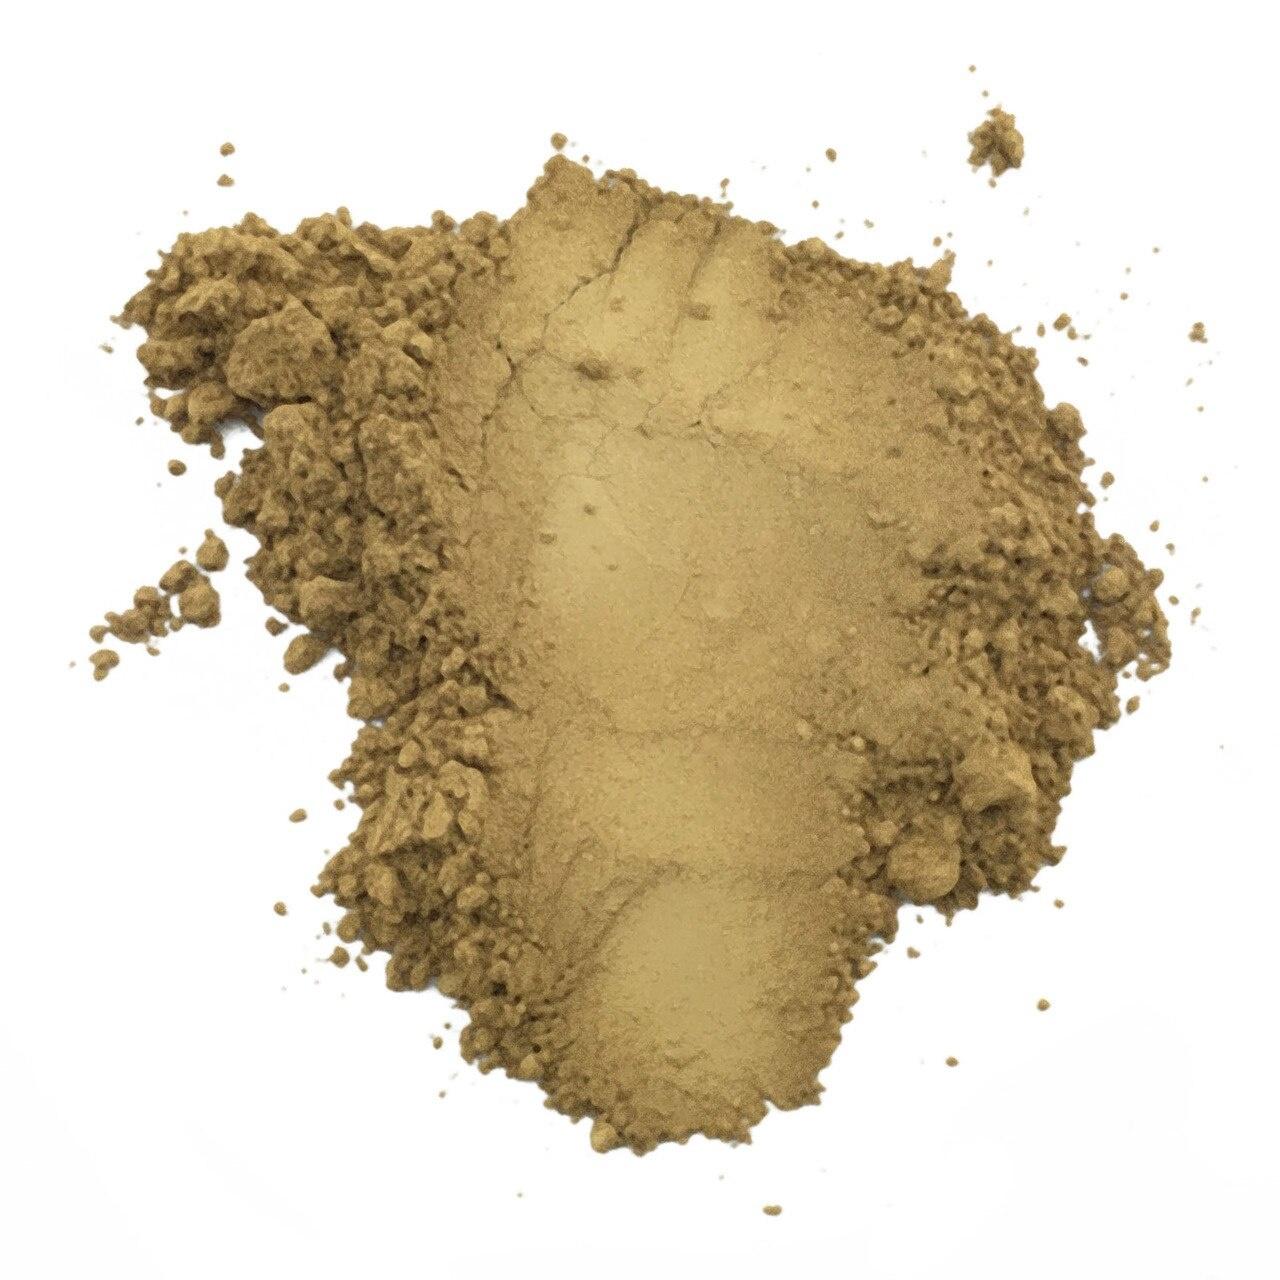 Loose Mineral Foundation - Niagara Fawn: Medium (Olive)-1